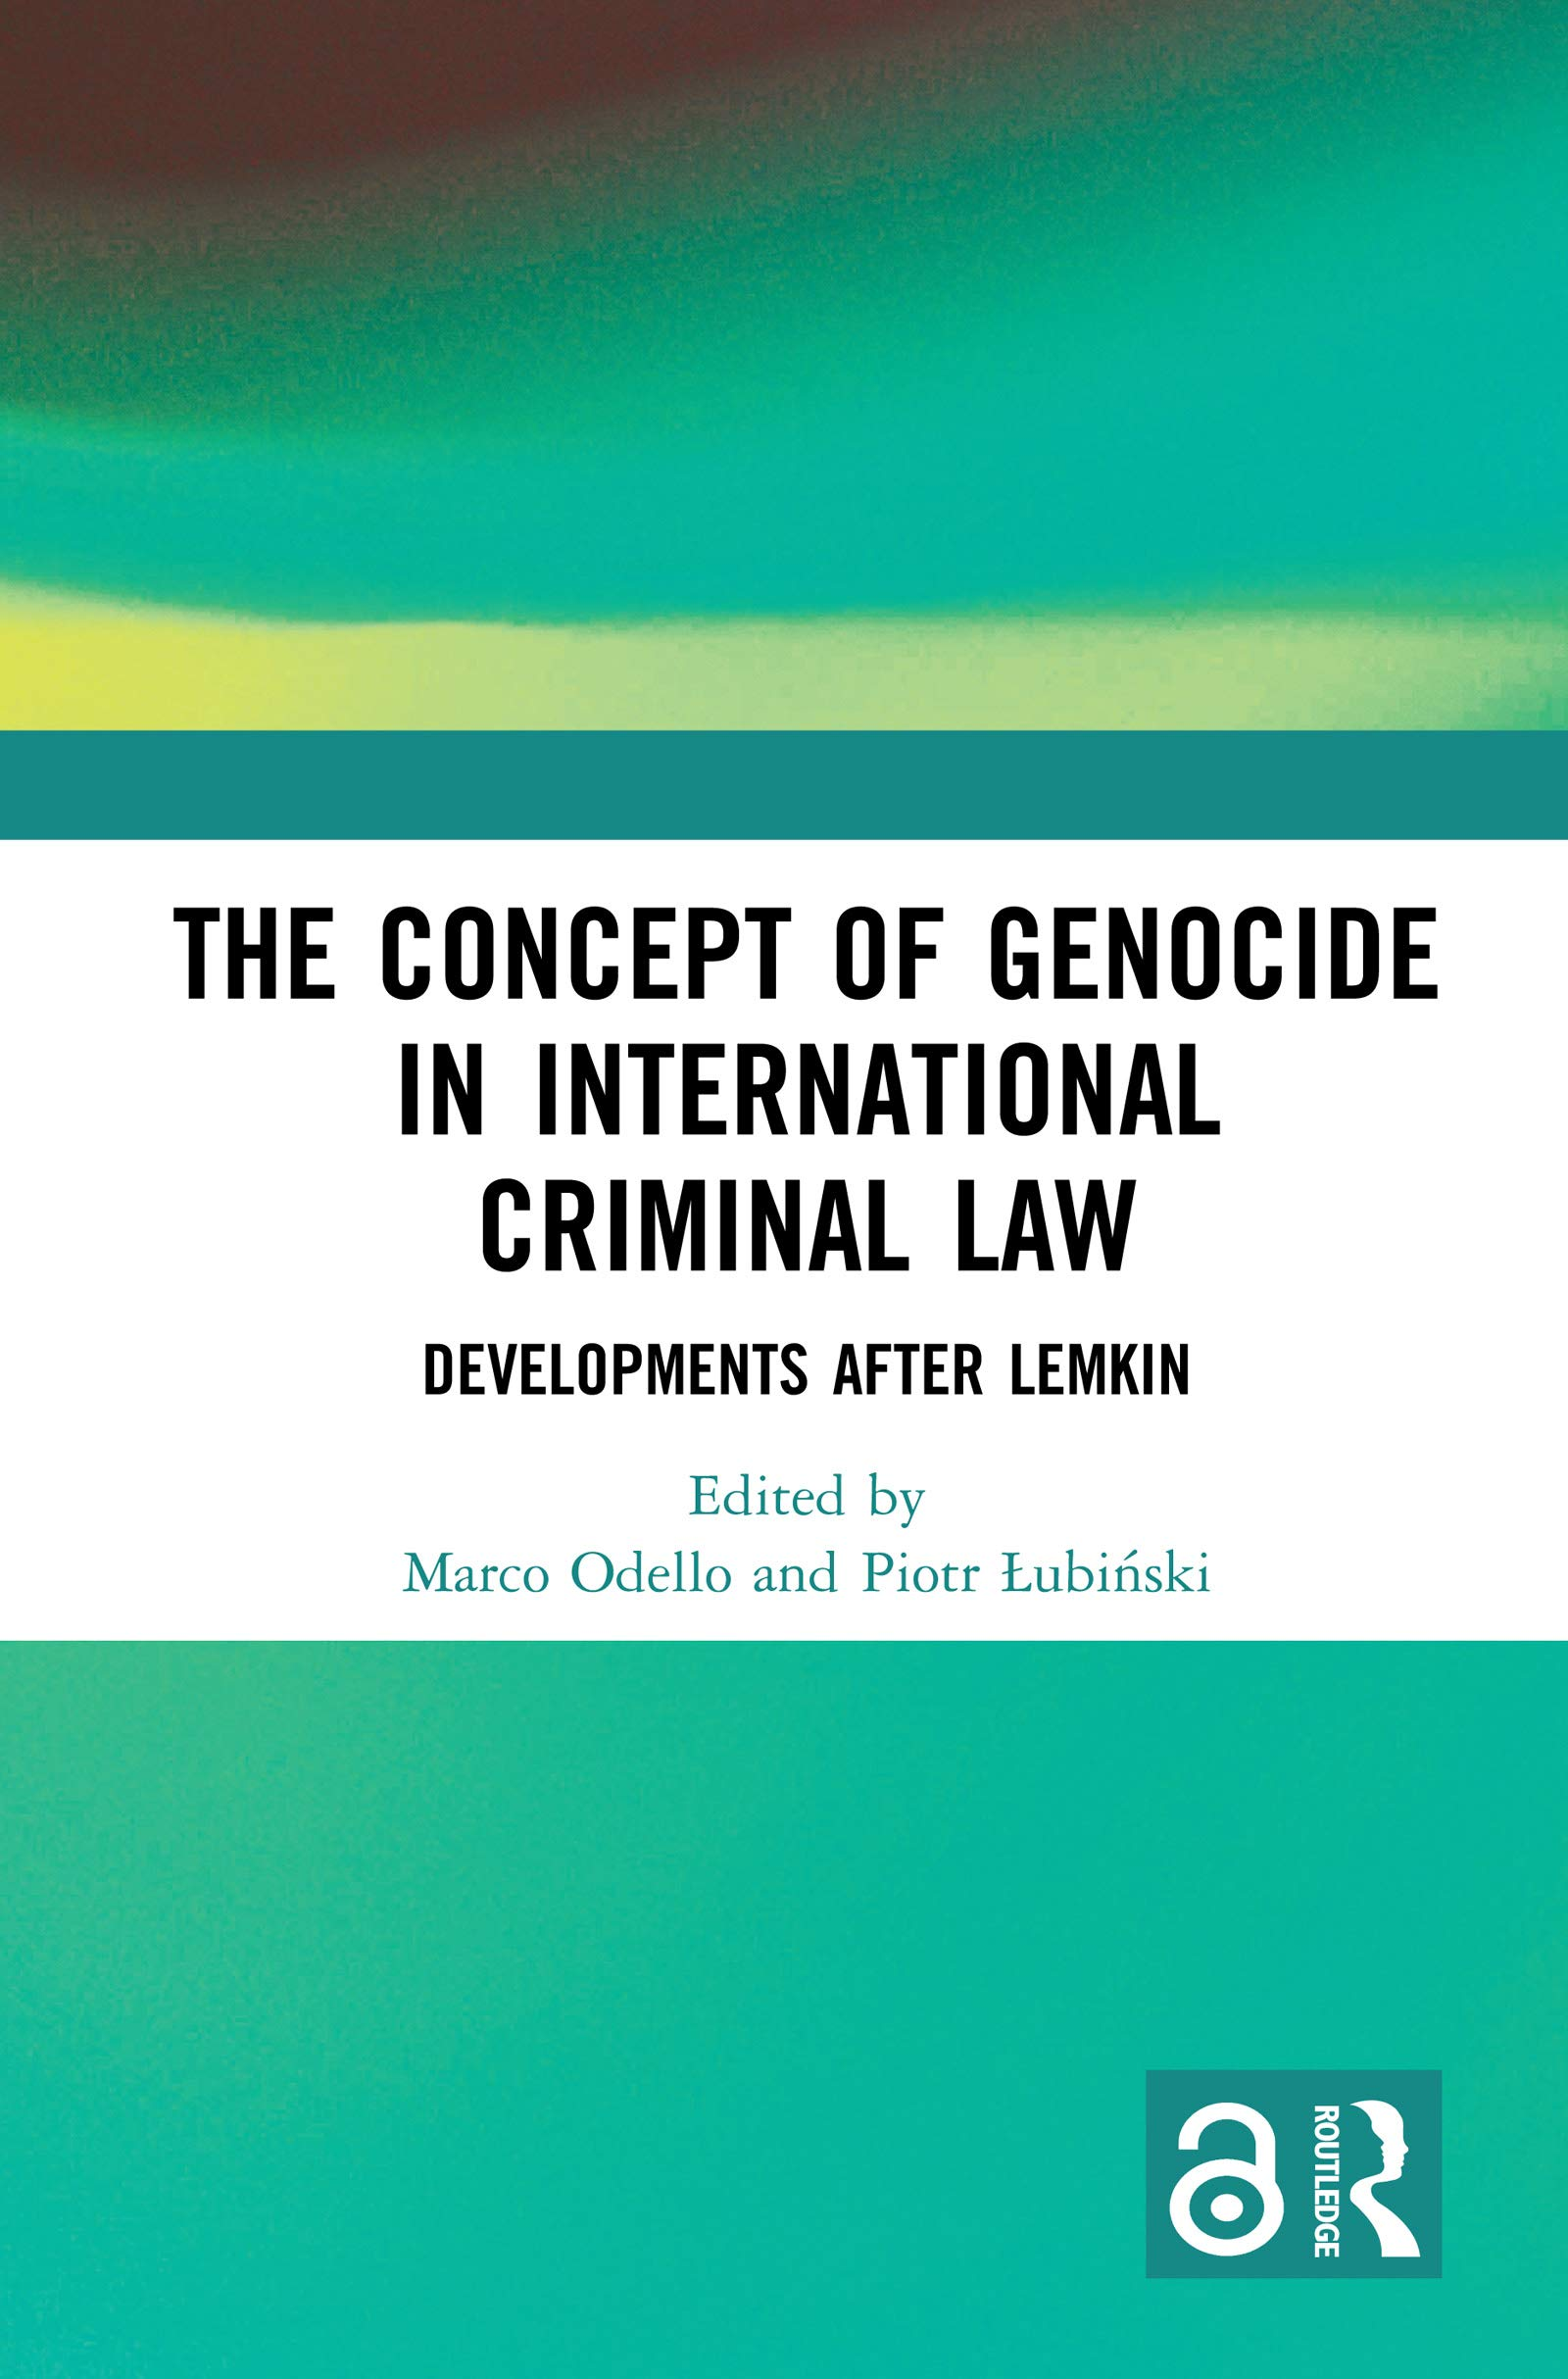 The Concept of Genocide in International Criminal Law: Developments after Lemkin